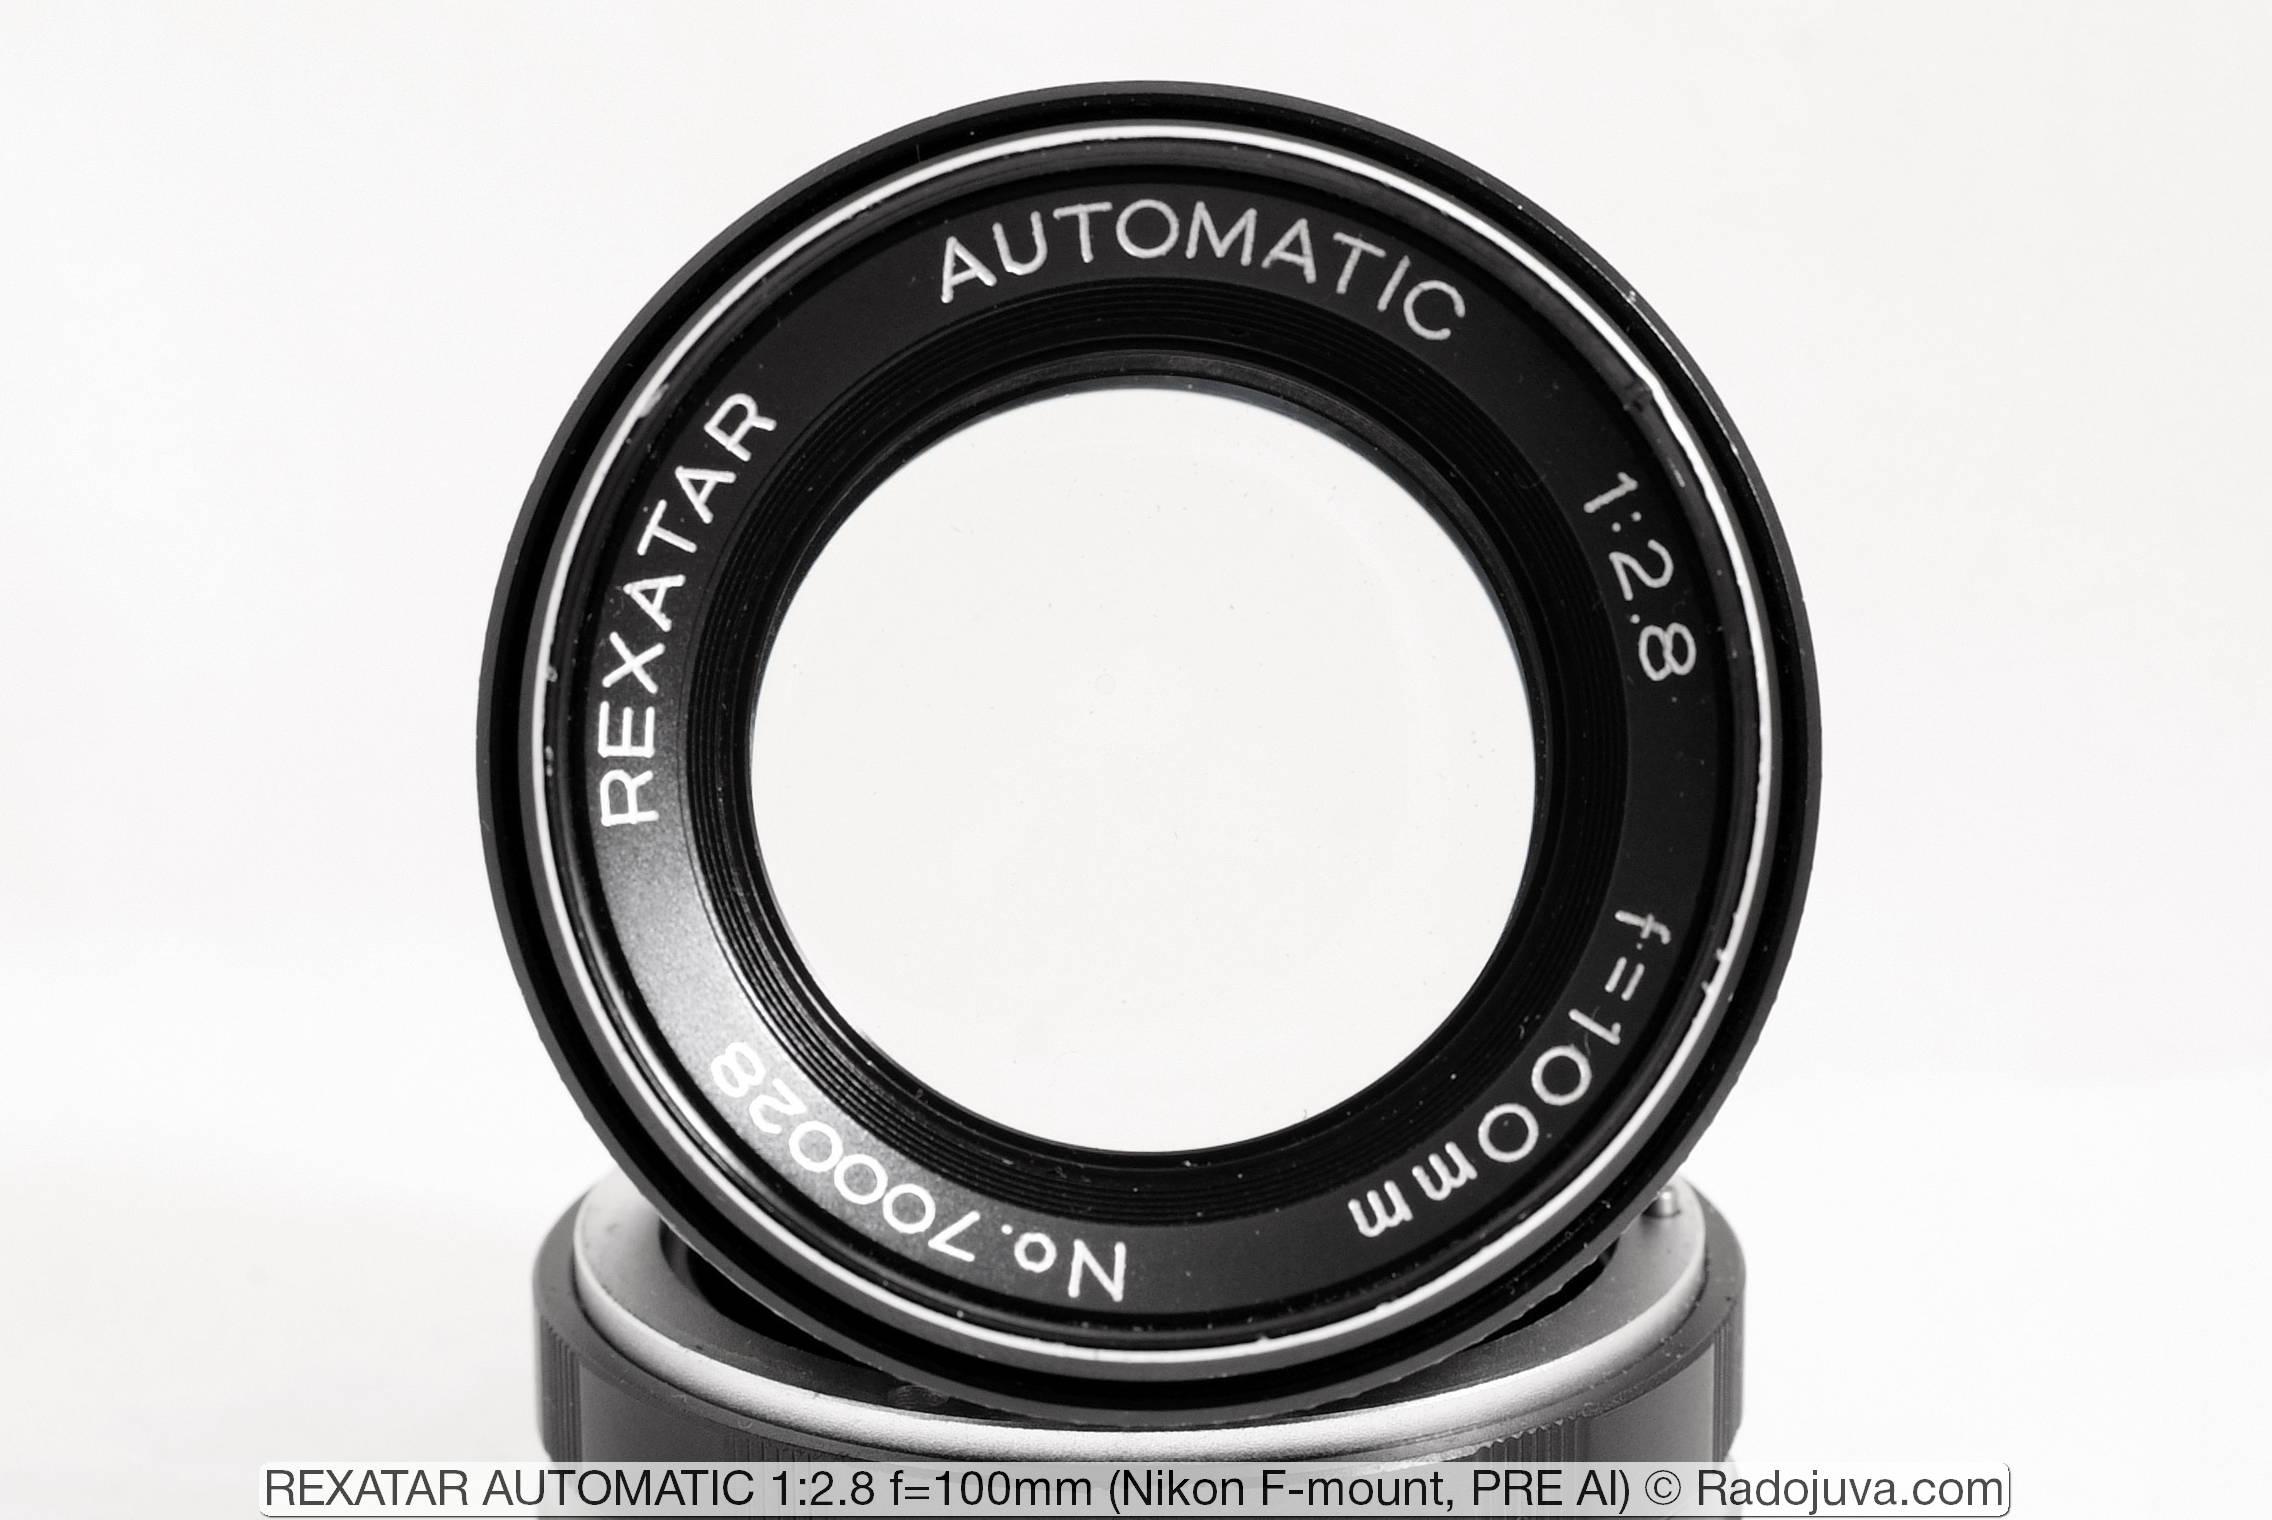 REXATAR AUTOMATIC 1:2.8 f=100mm